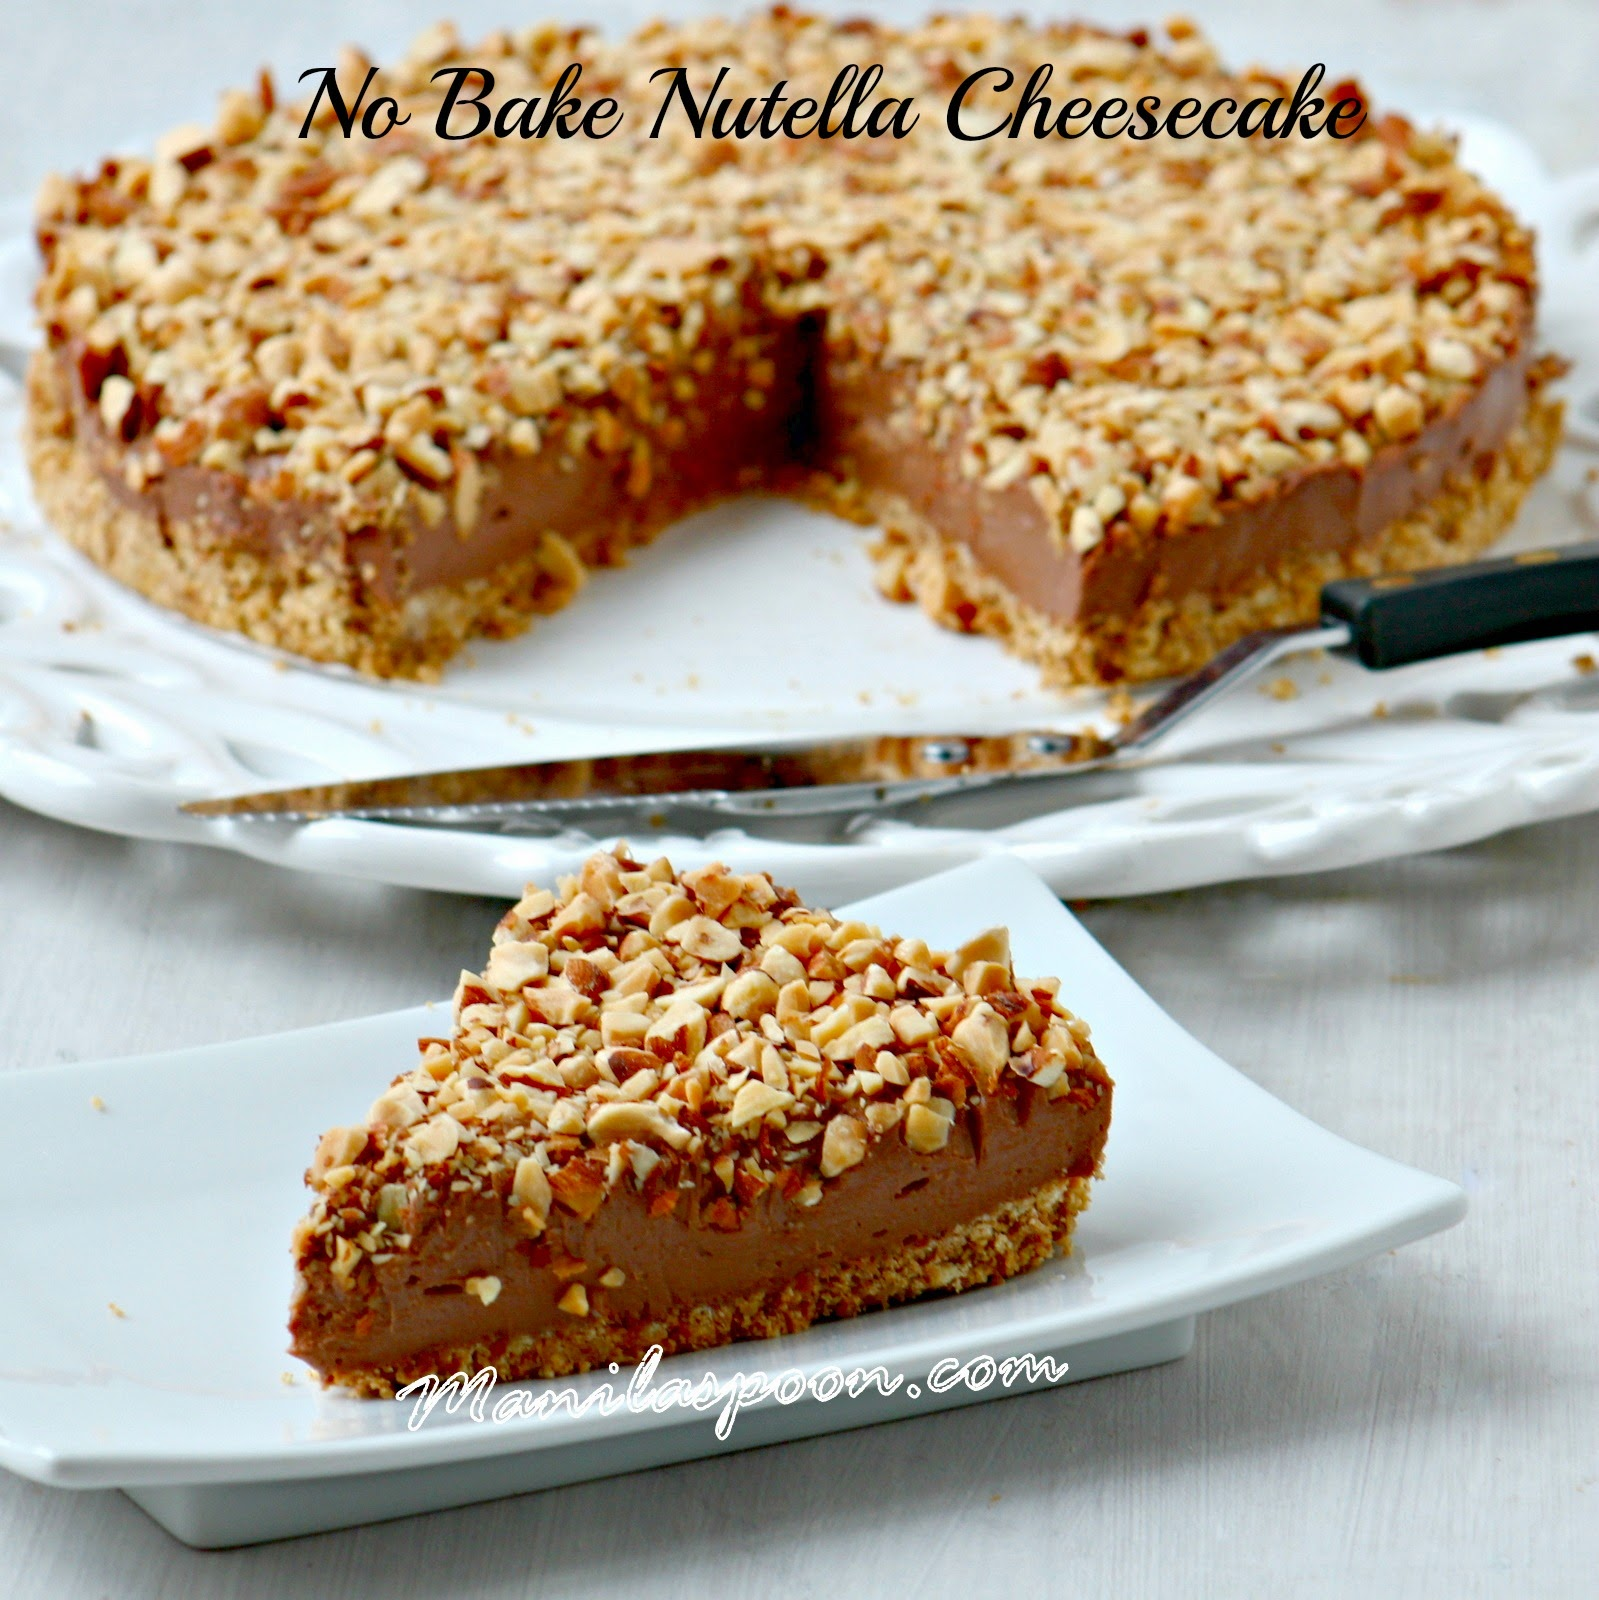 No bake cakes recipes philippines